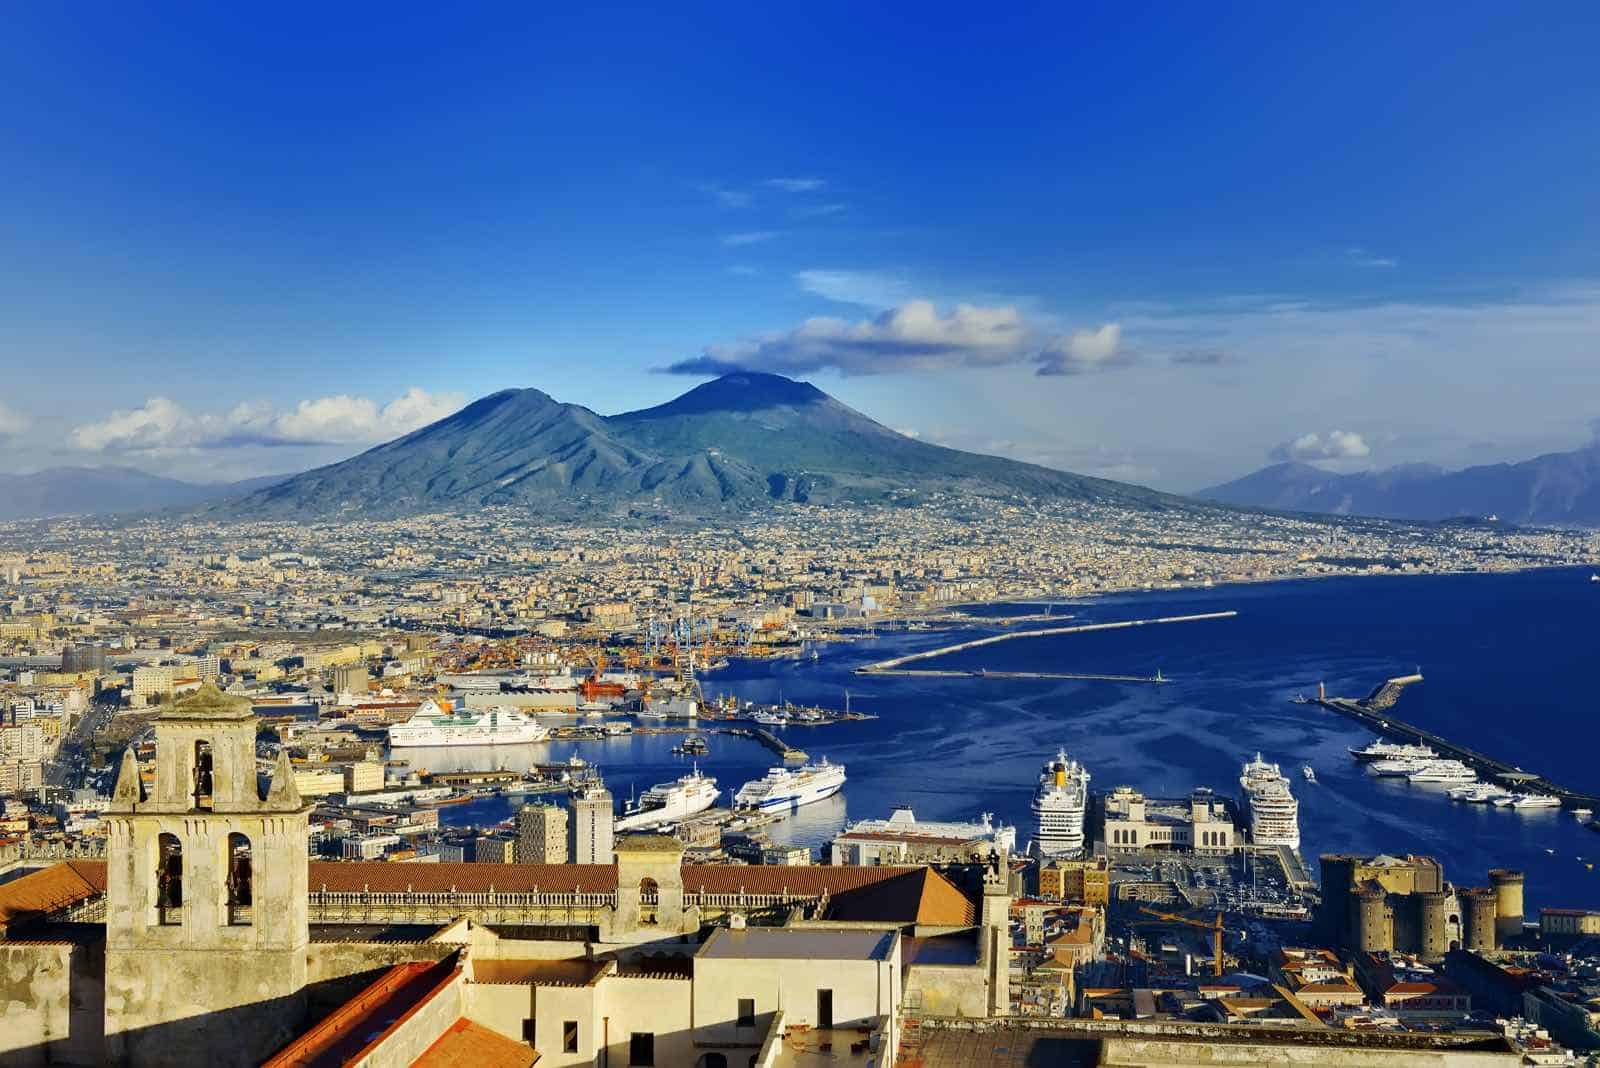 Napoli med Vesuv i baggrunden